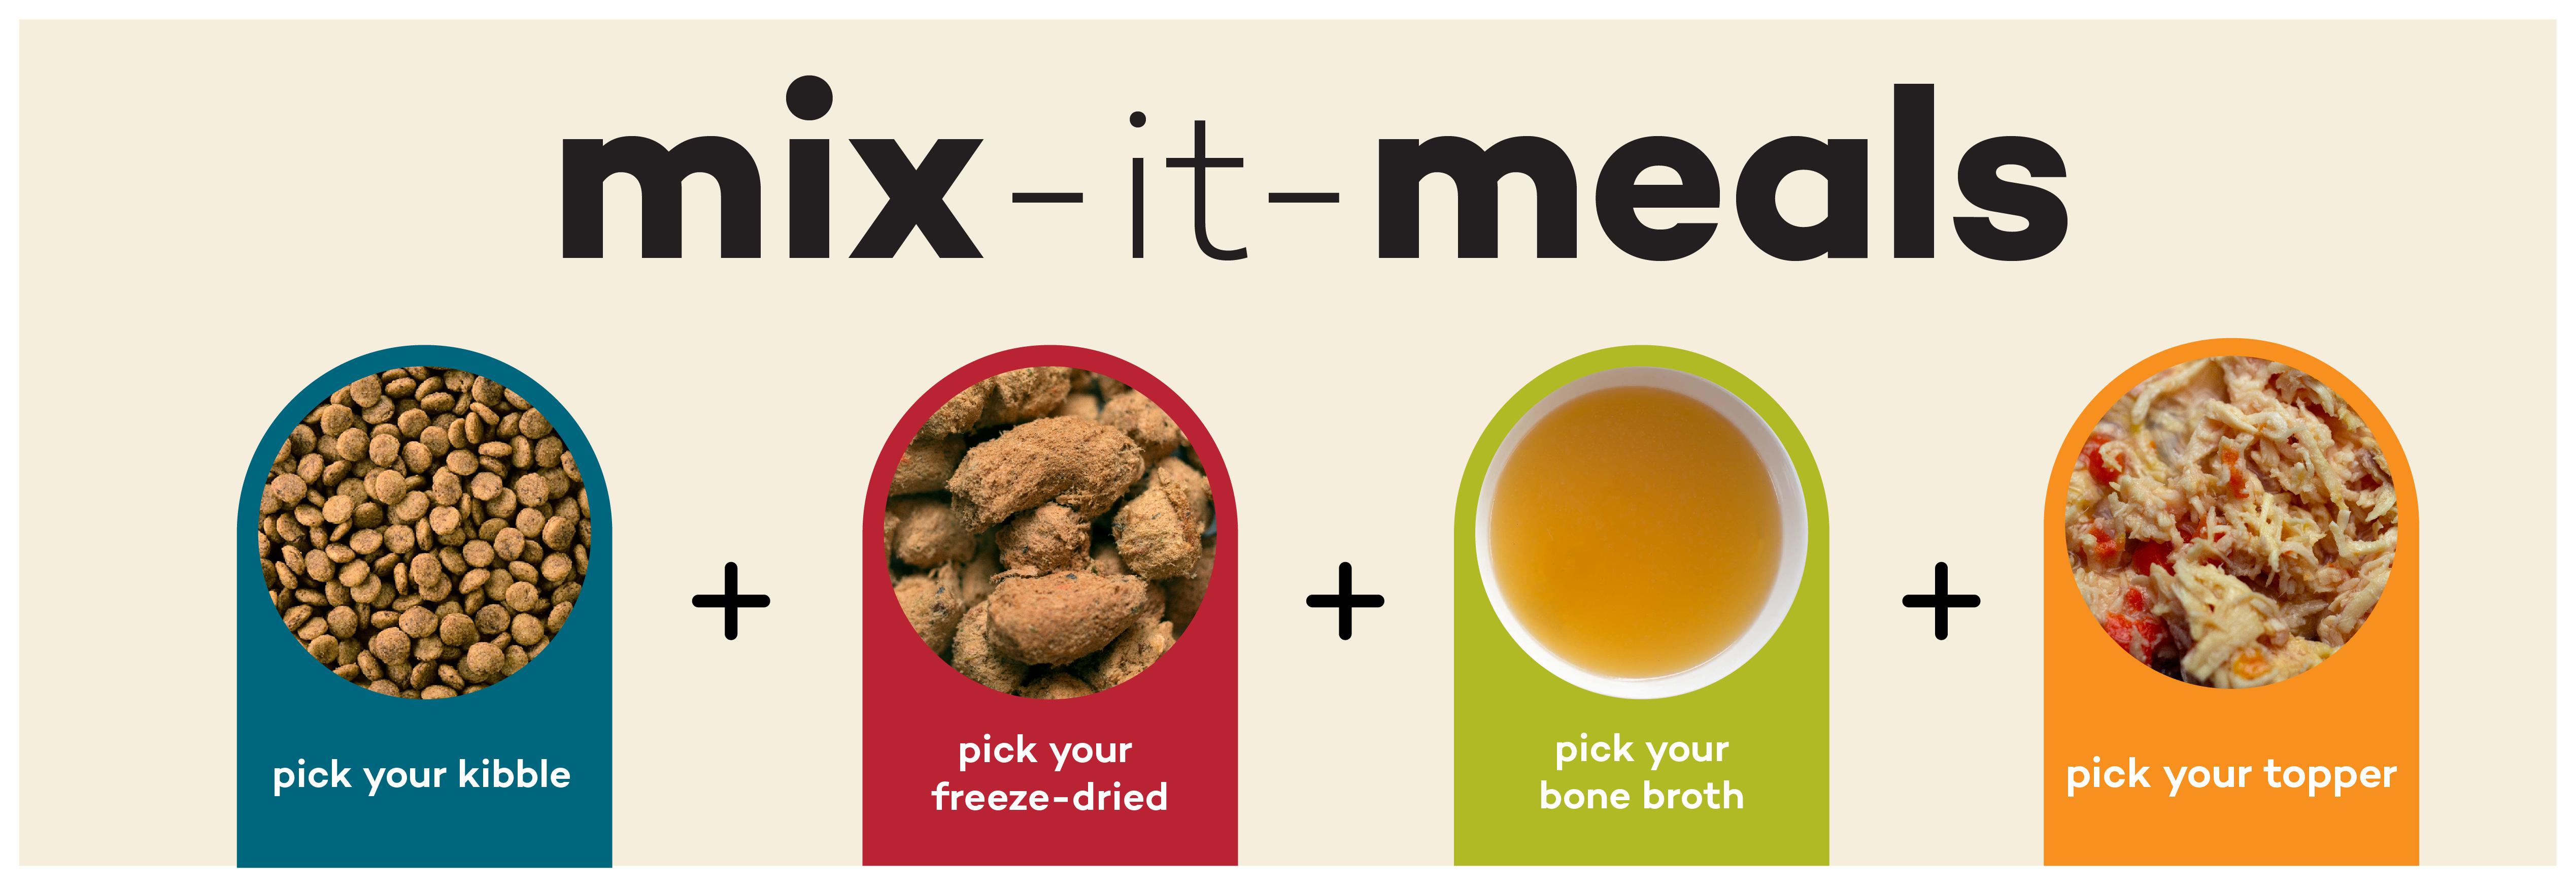 mix-it-meals